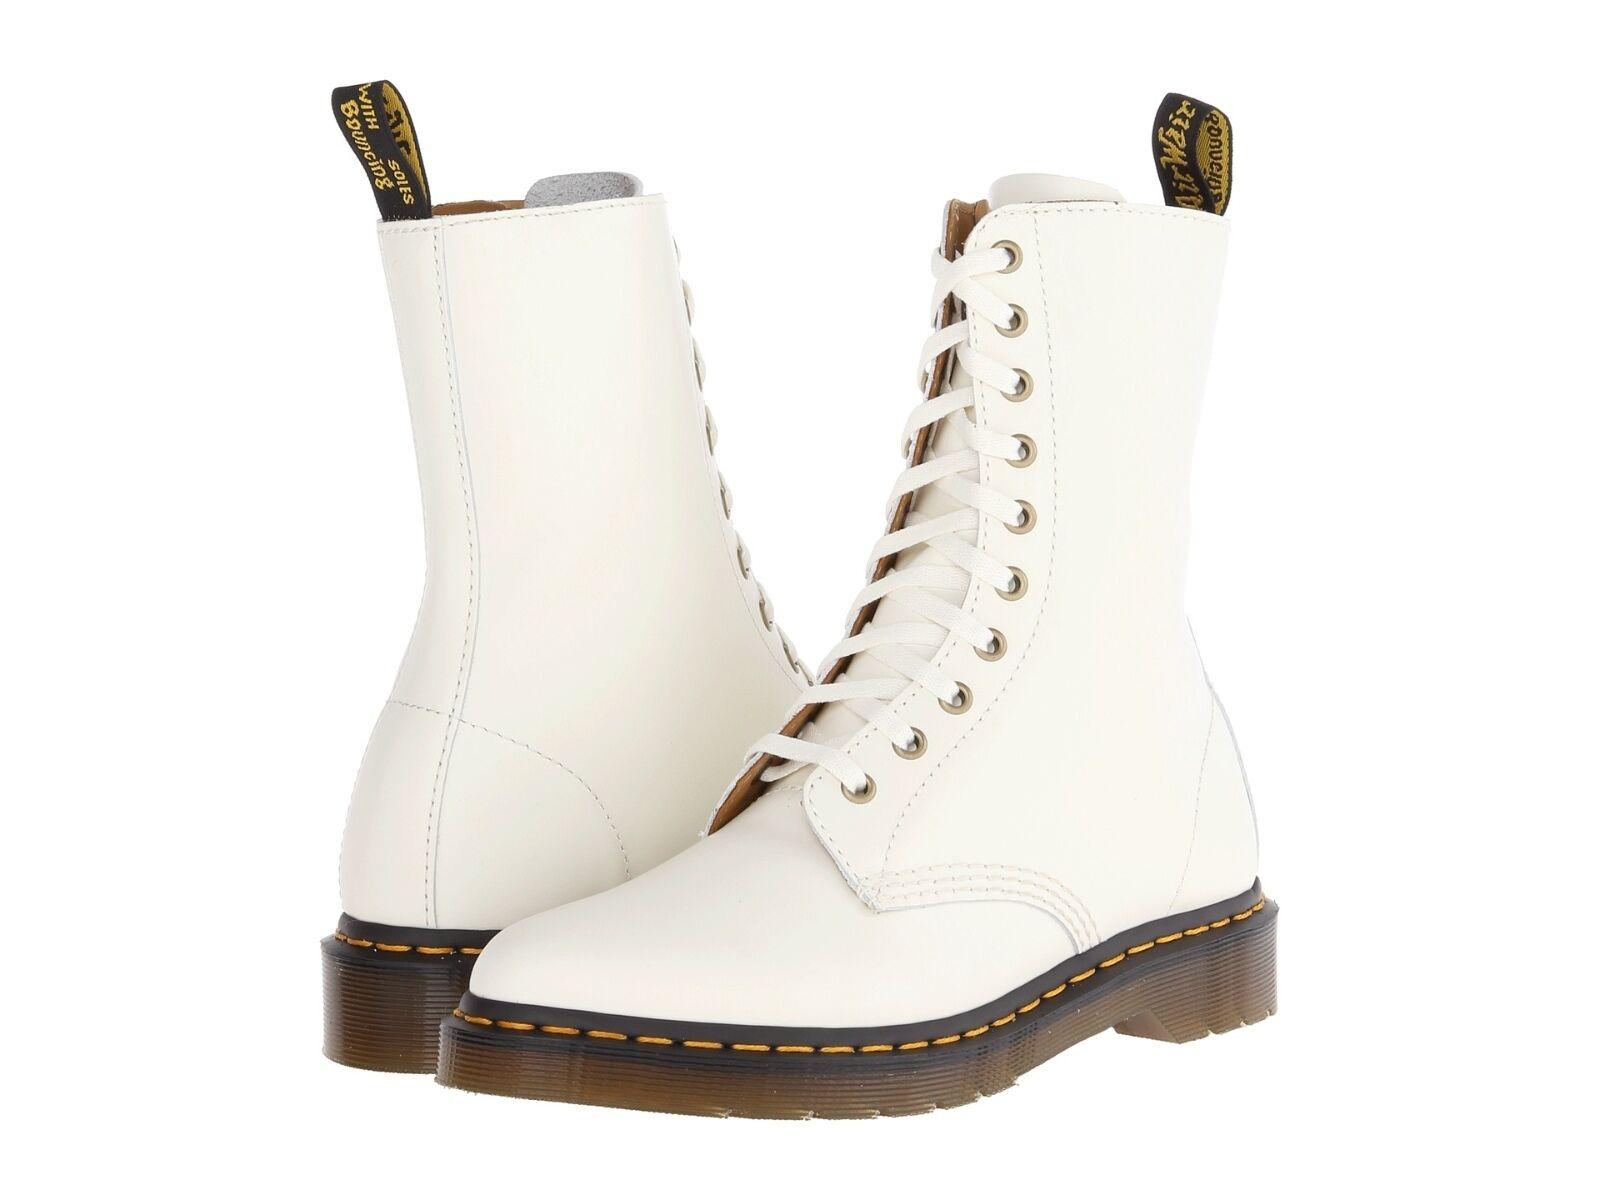 Dr. Martens  Women's Alix Pointy Toed 10 eye Zip White Boots US 9 EU 41 UK 7